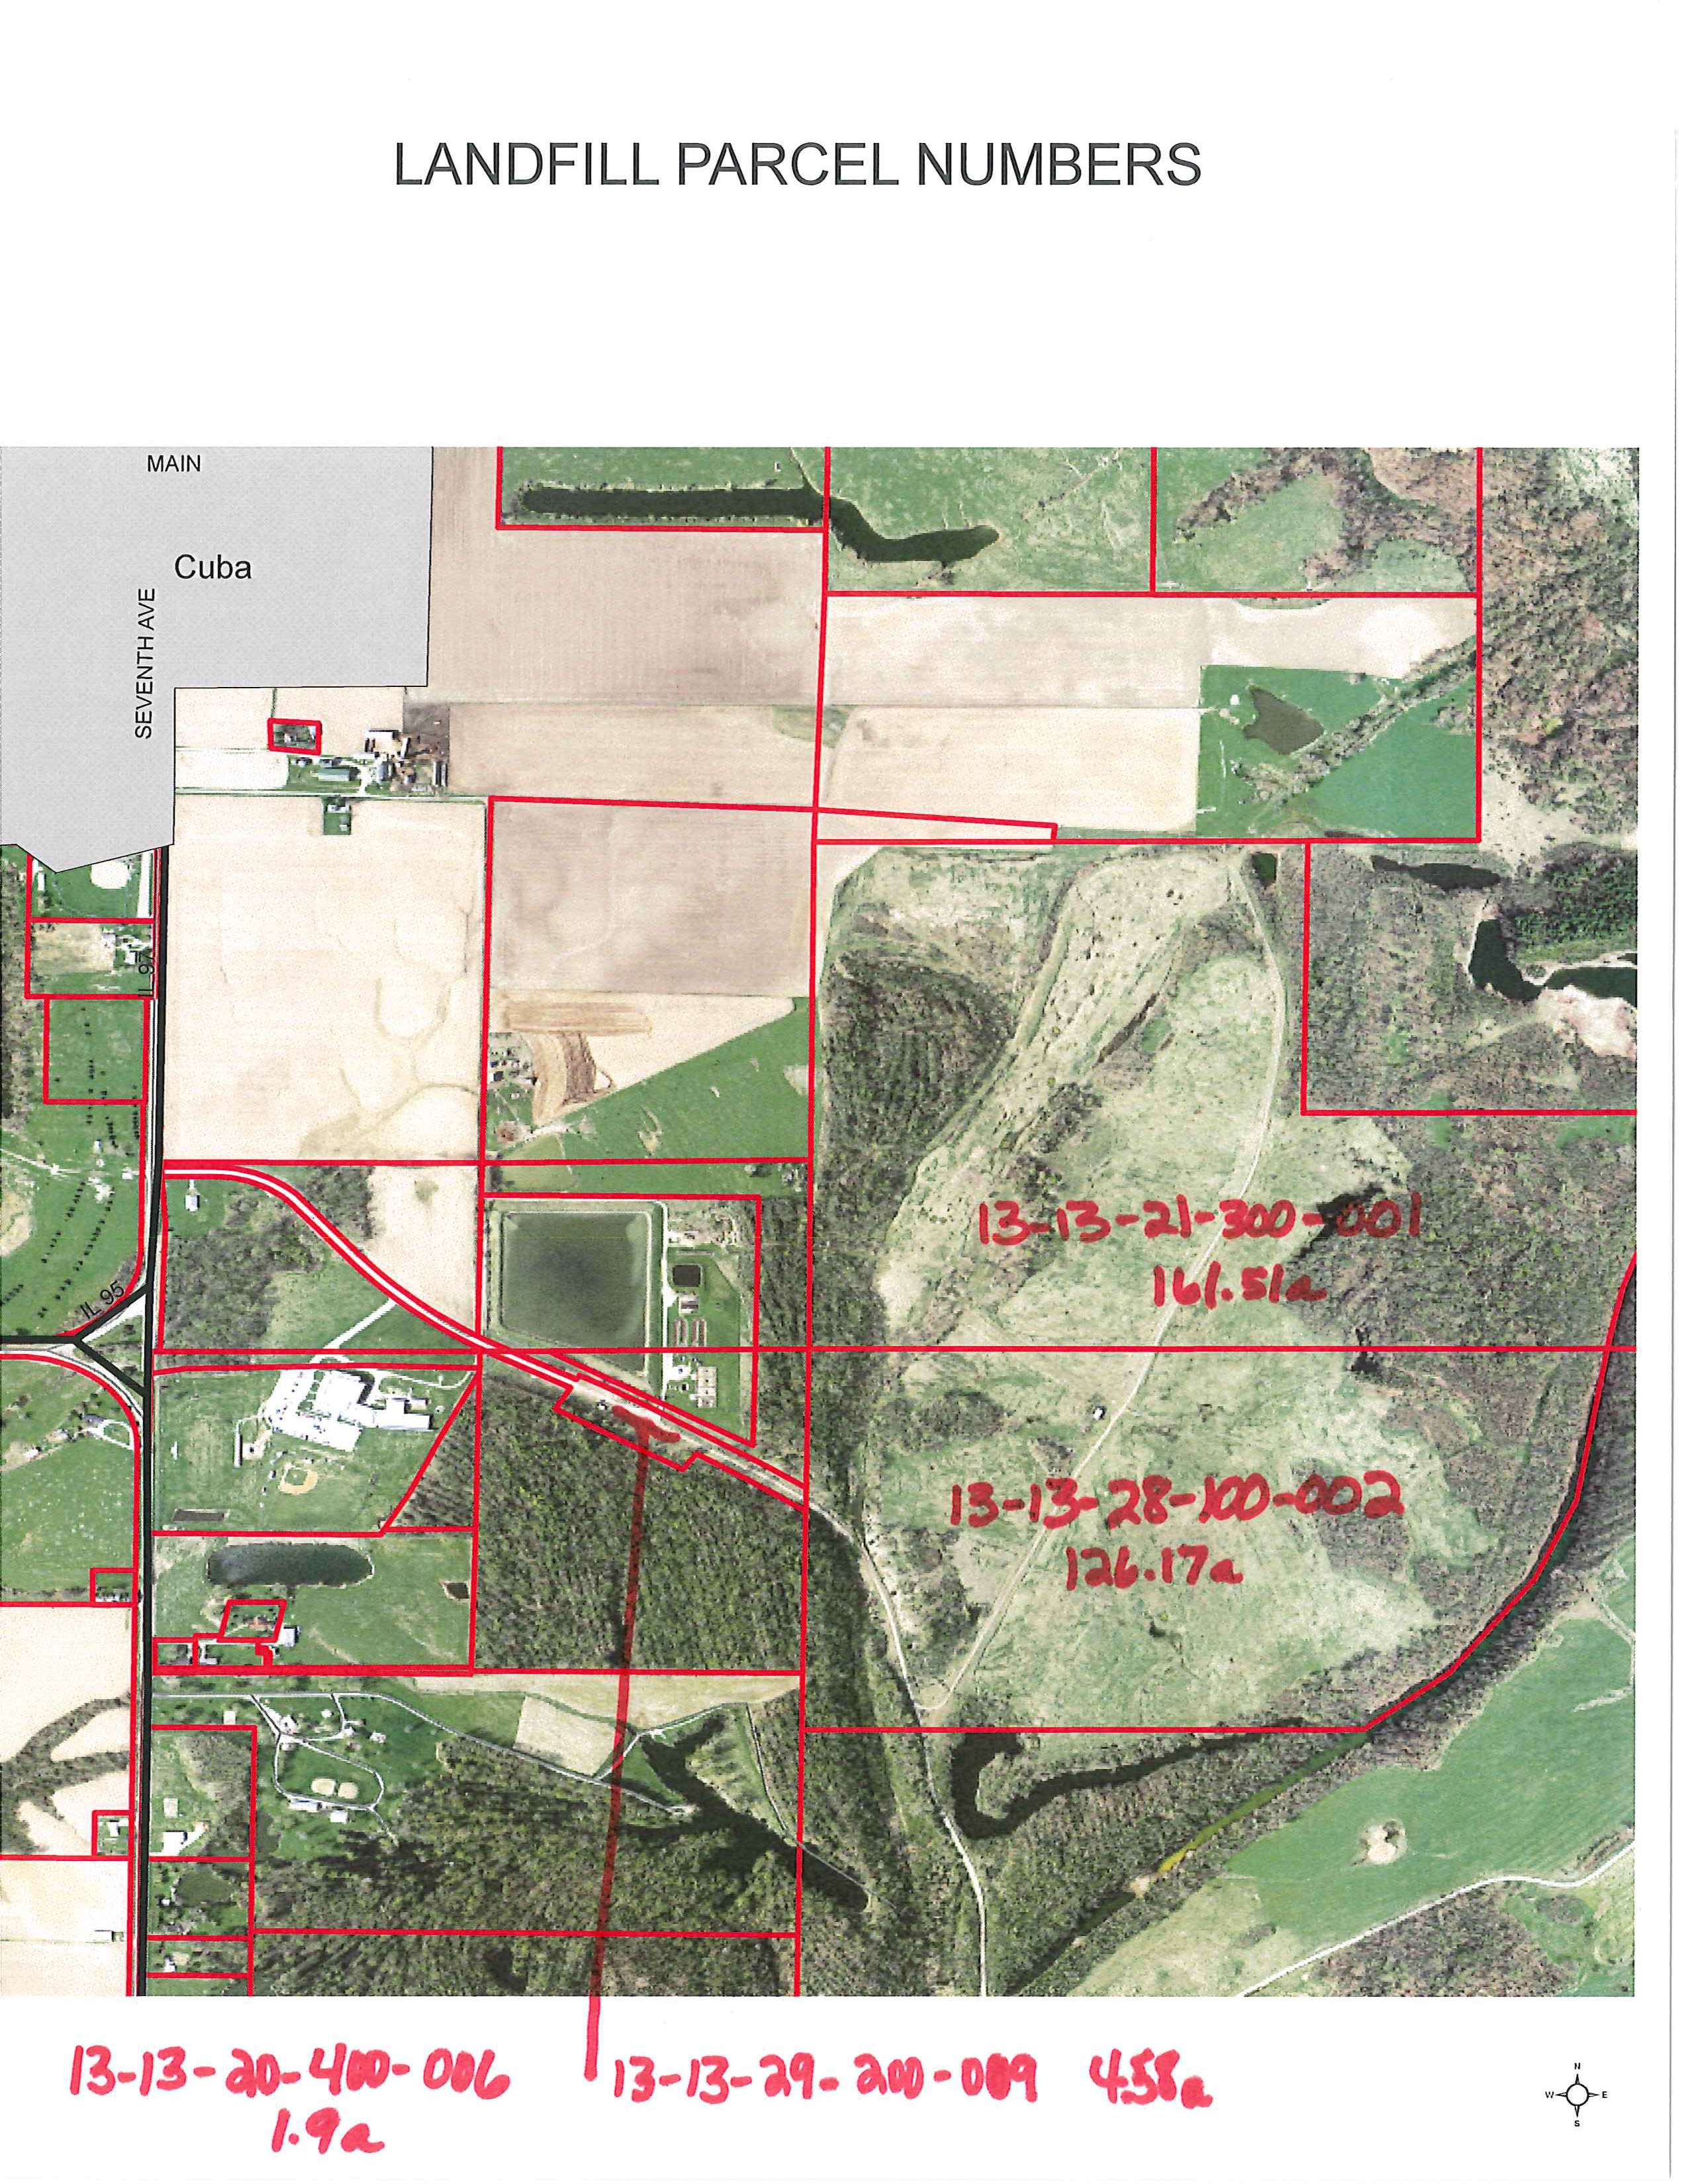 Illinois fulton county vermont - Fulton County Illinois